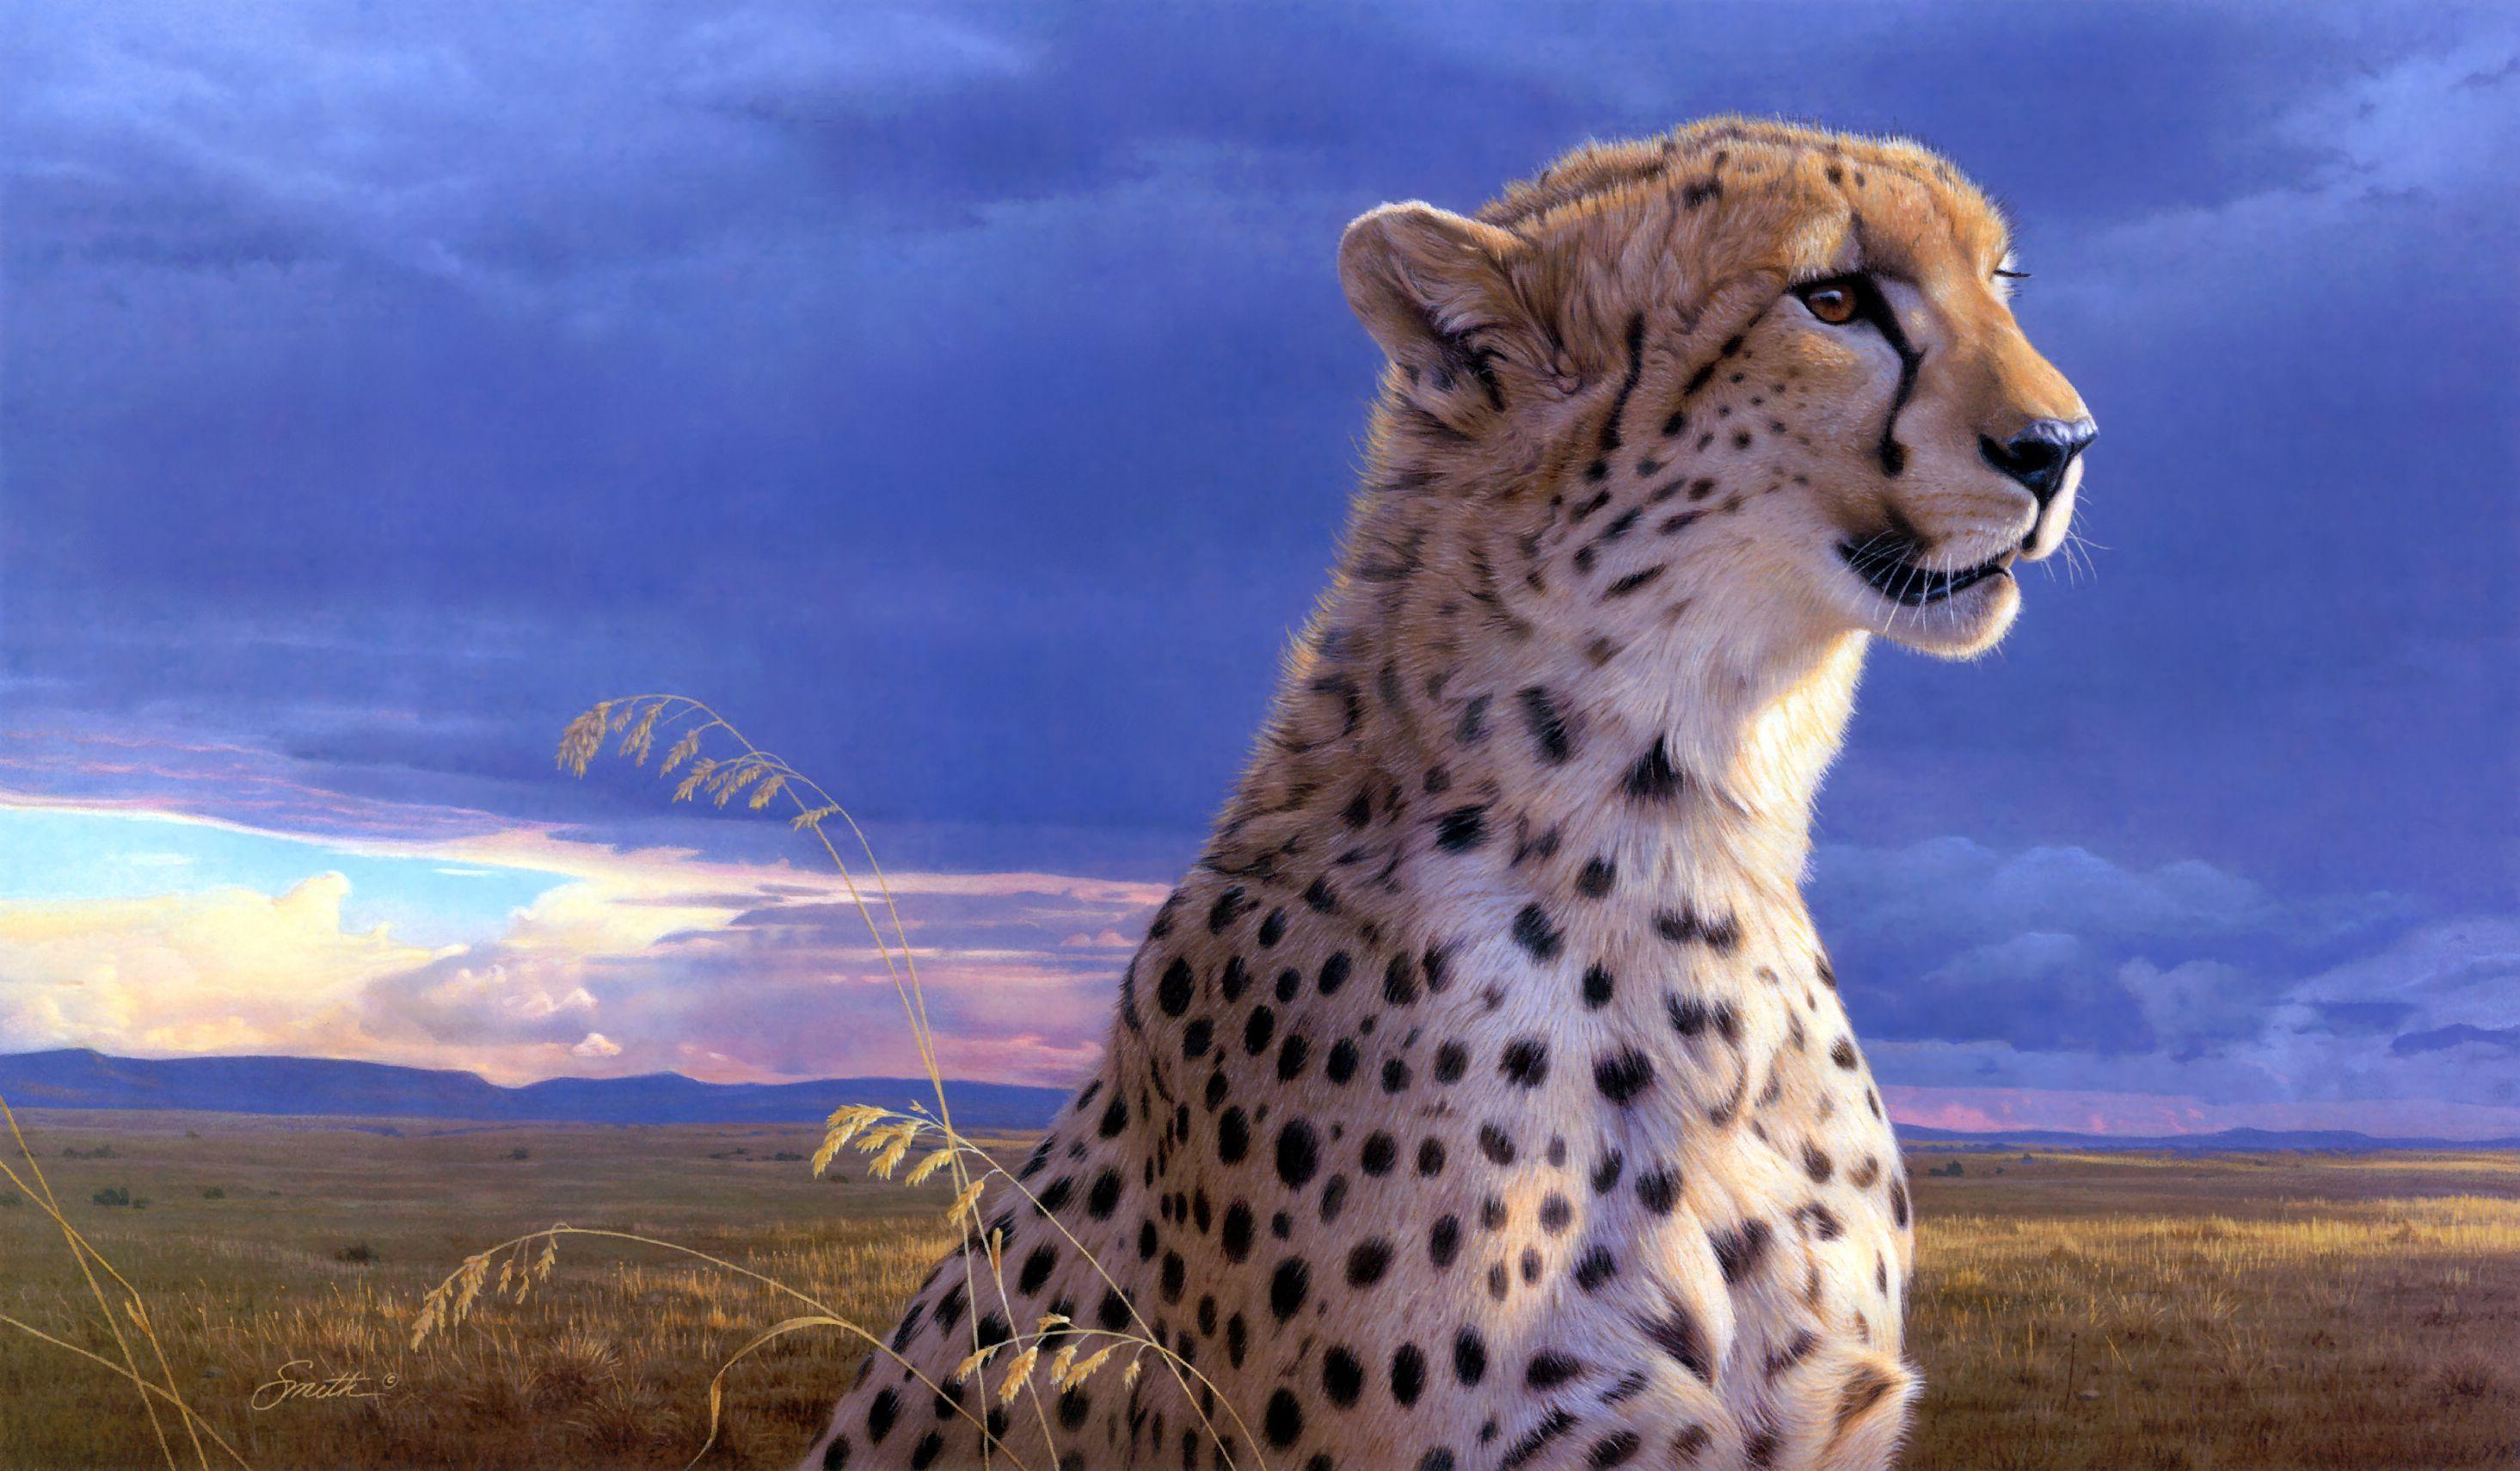 3d Cheetah Wallpaper Cheetah Photos Free Hd Desktop Wallpapers 4k Hd